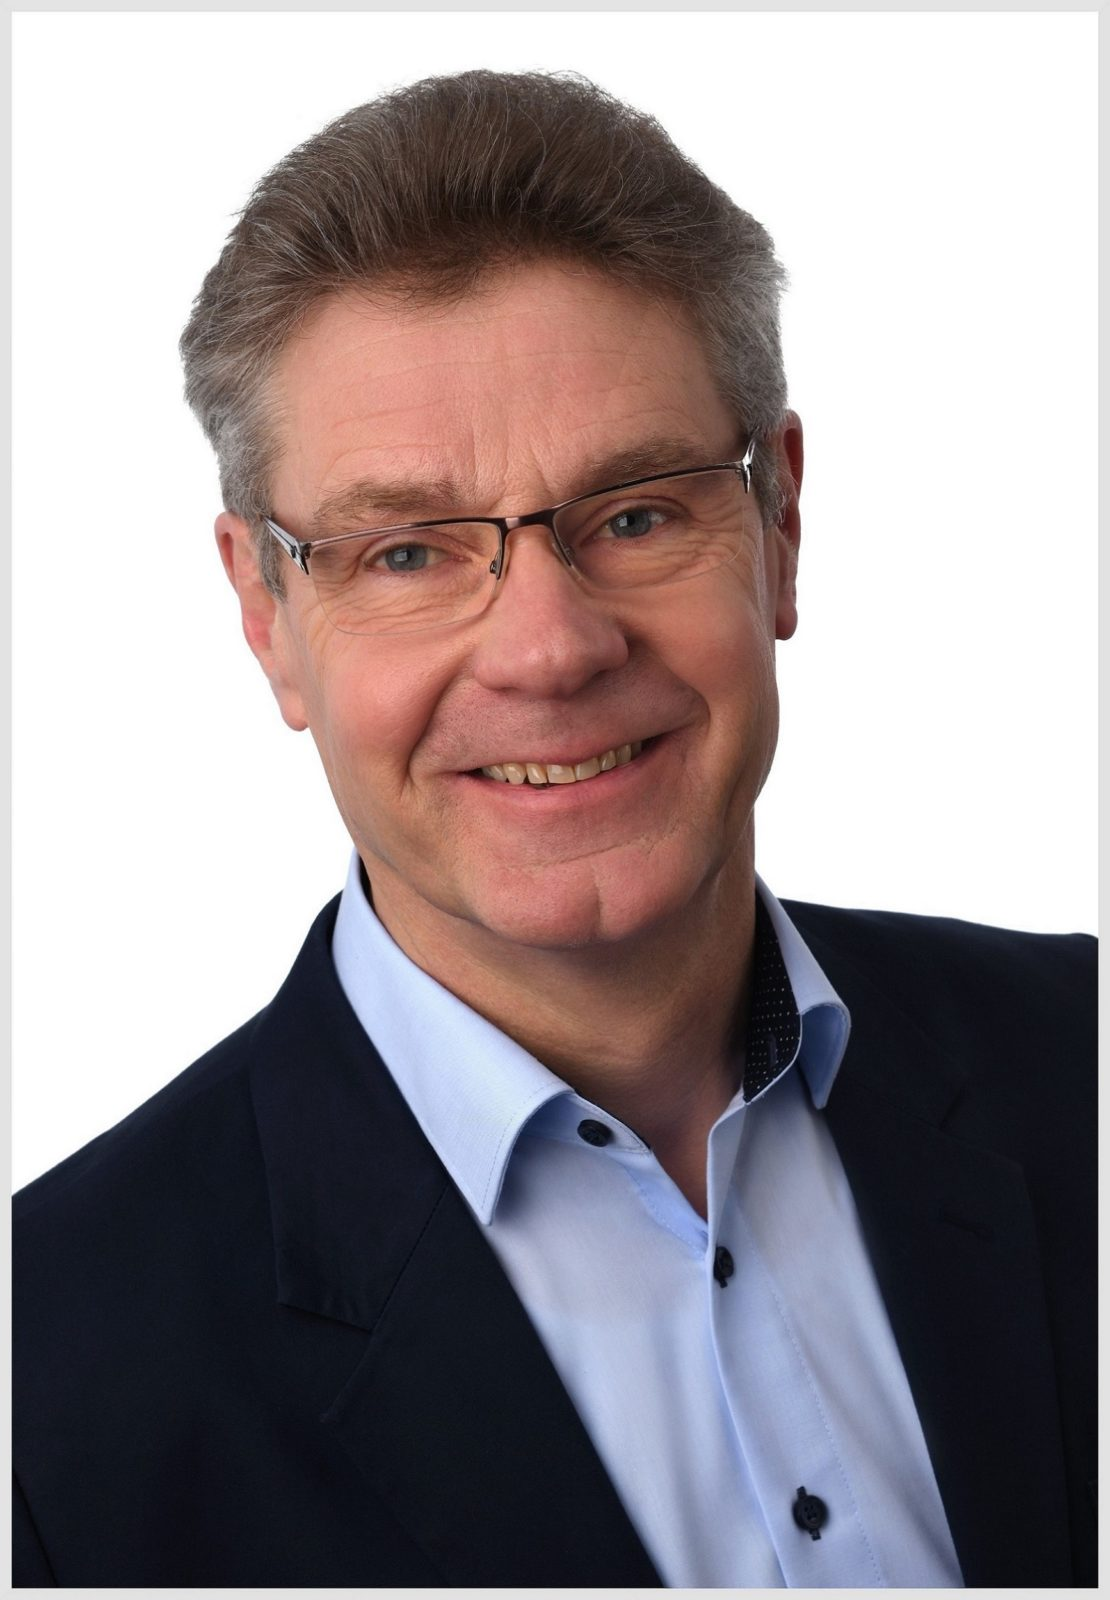 Günter Hovestadt